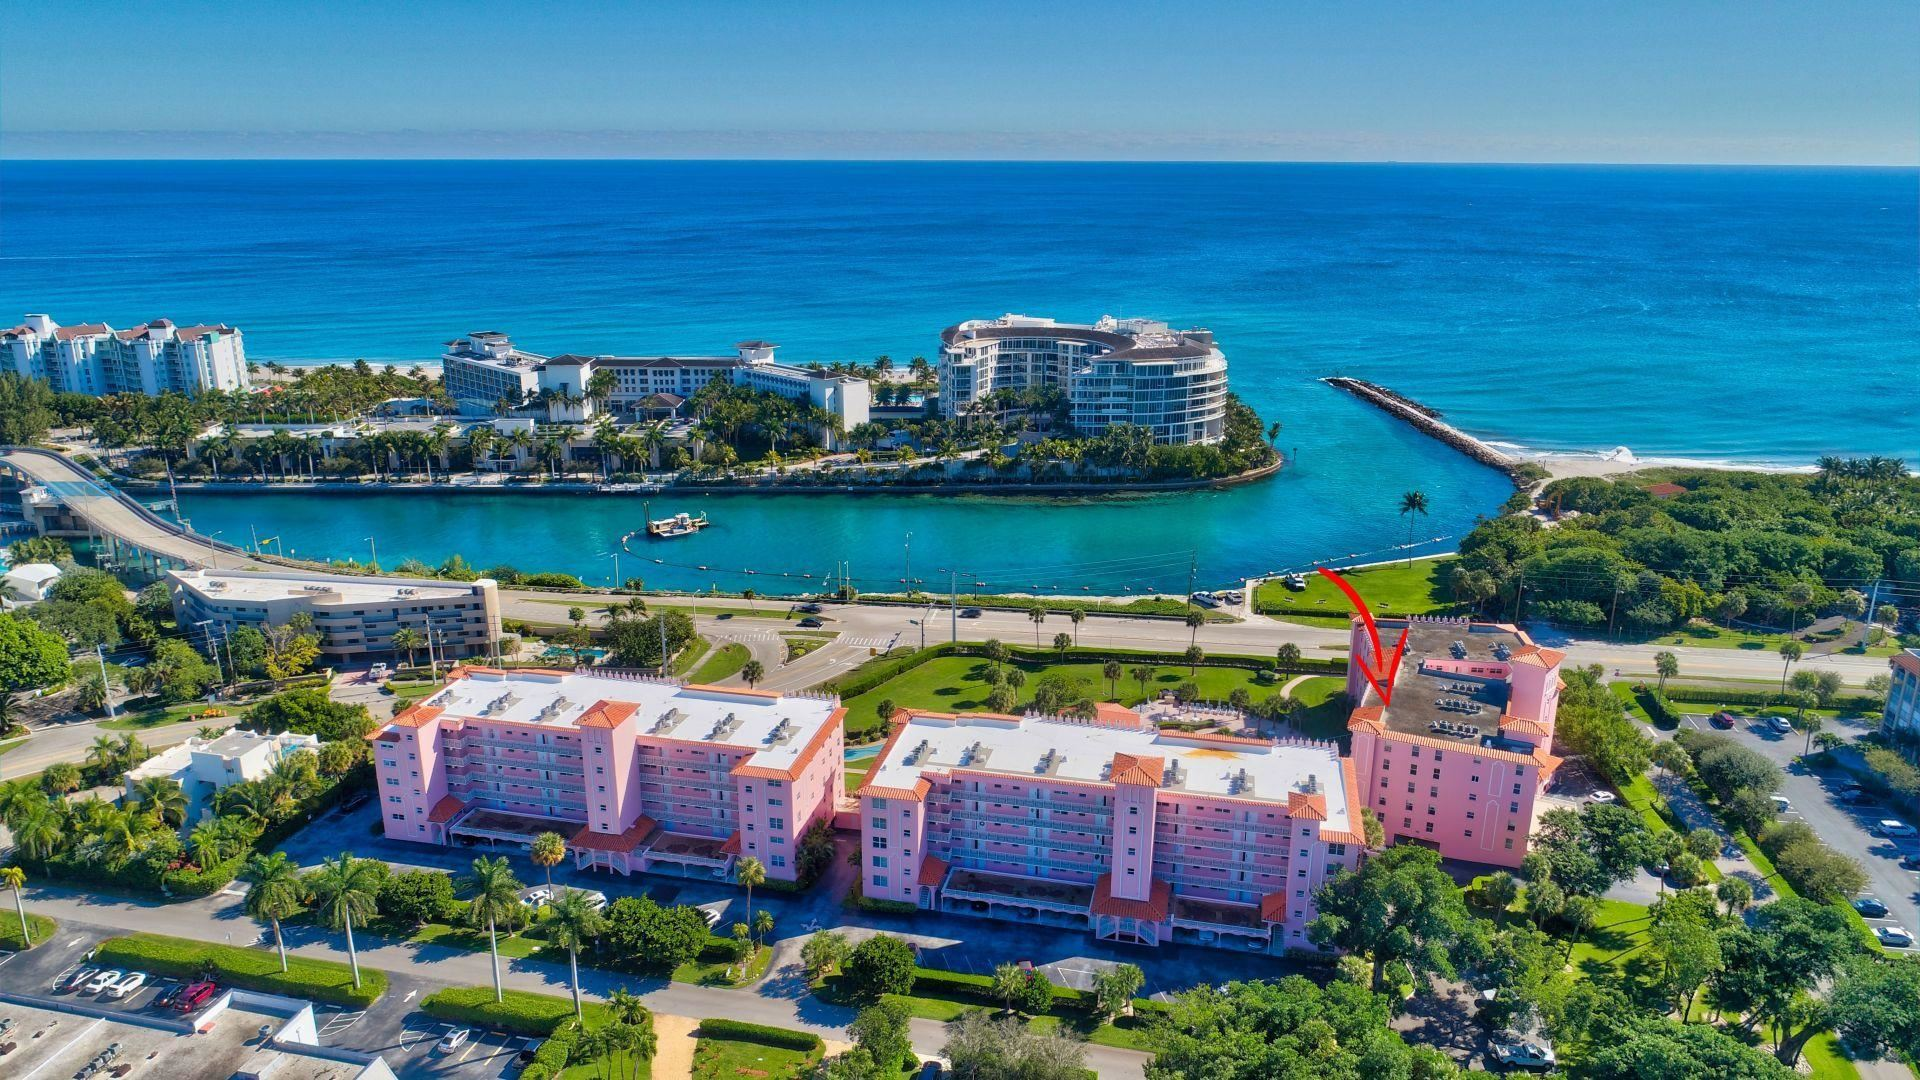 1099 S Ocean Blvd Boulevard #205-S, Boca Raton, FL 33432 - #: RX-10656460